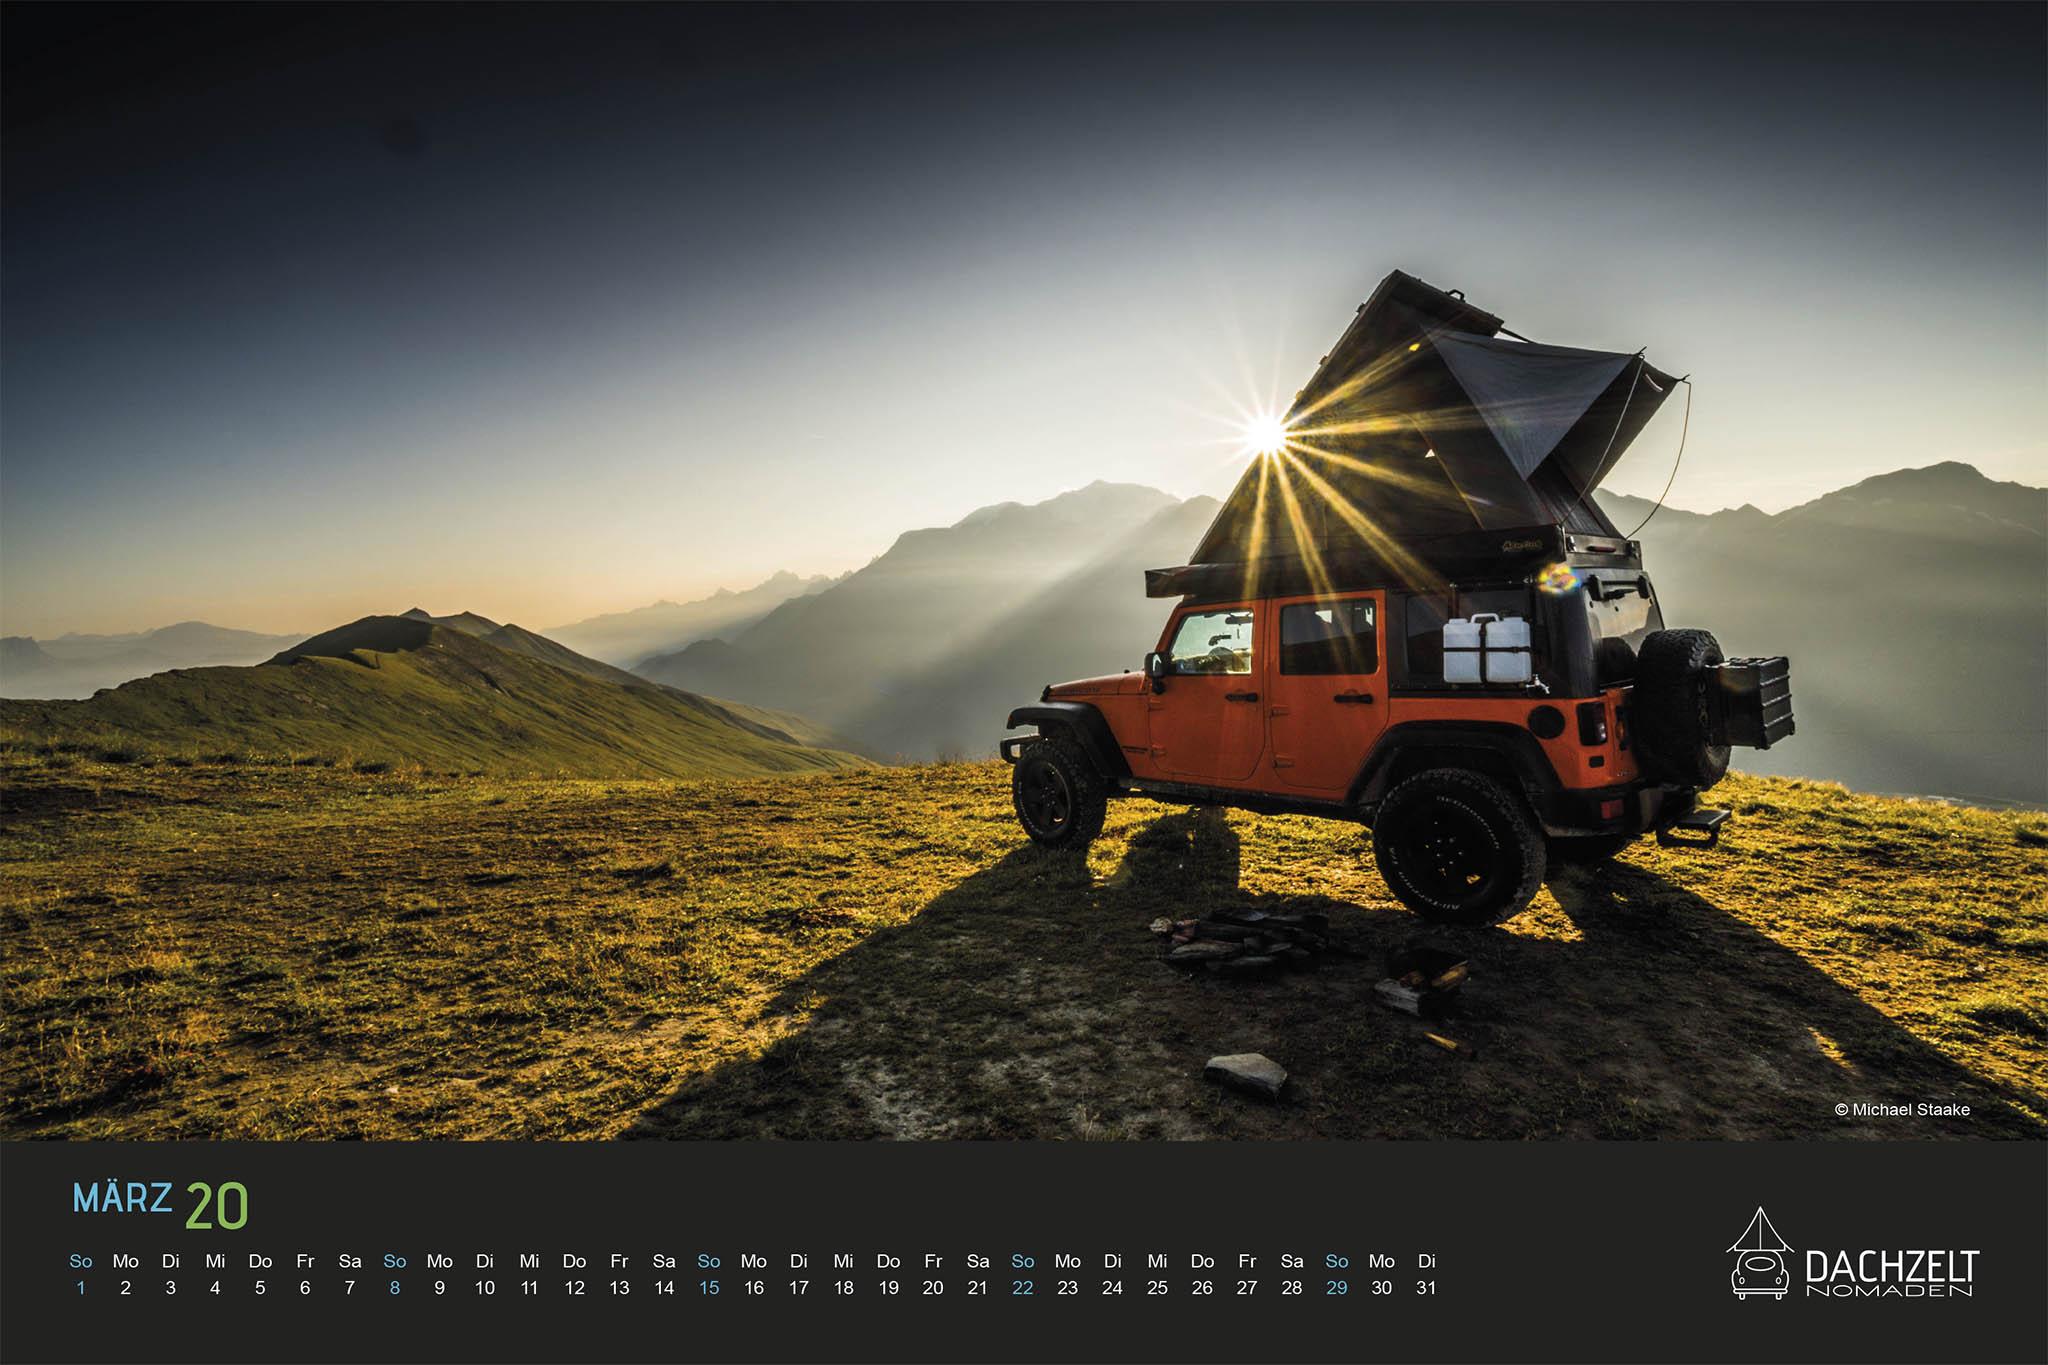 Dachzeltnomaden-Dachzelt-Kalender-2020-März.jpg